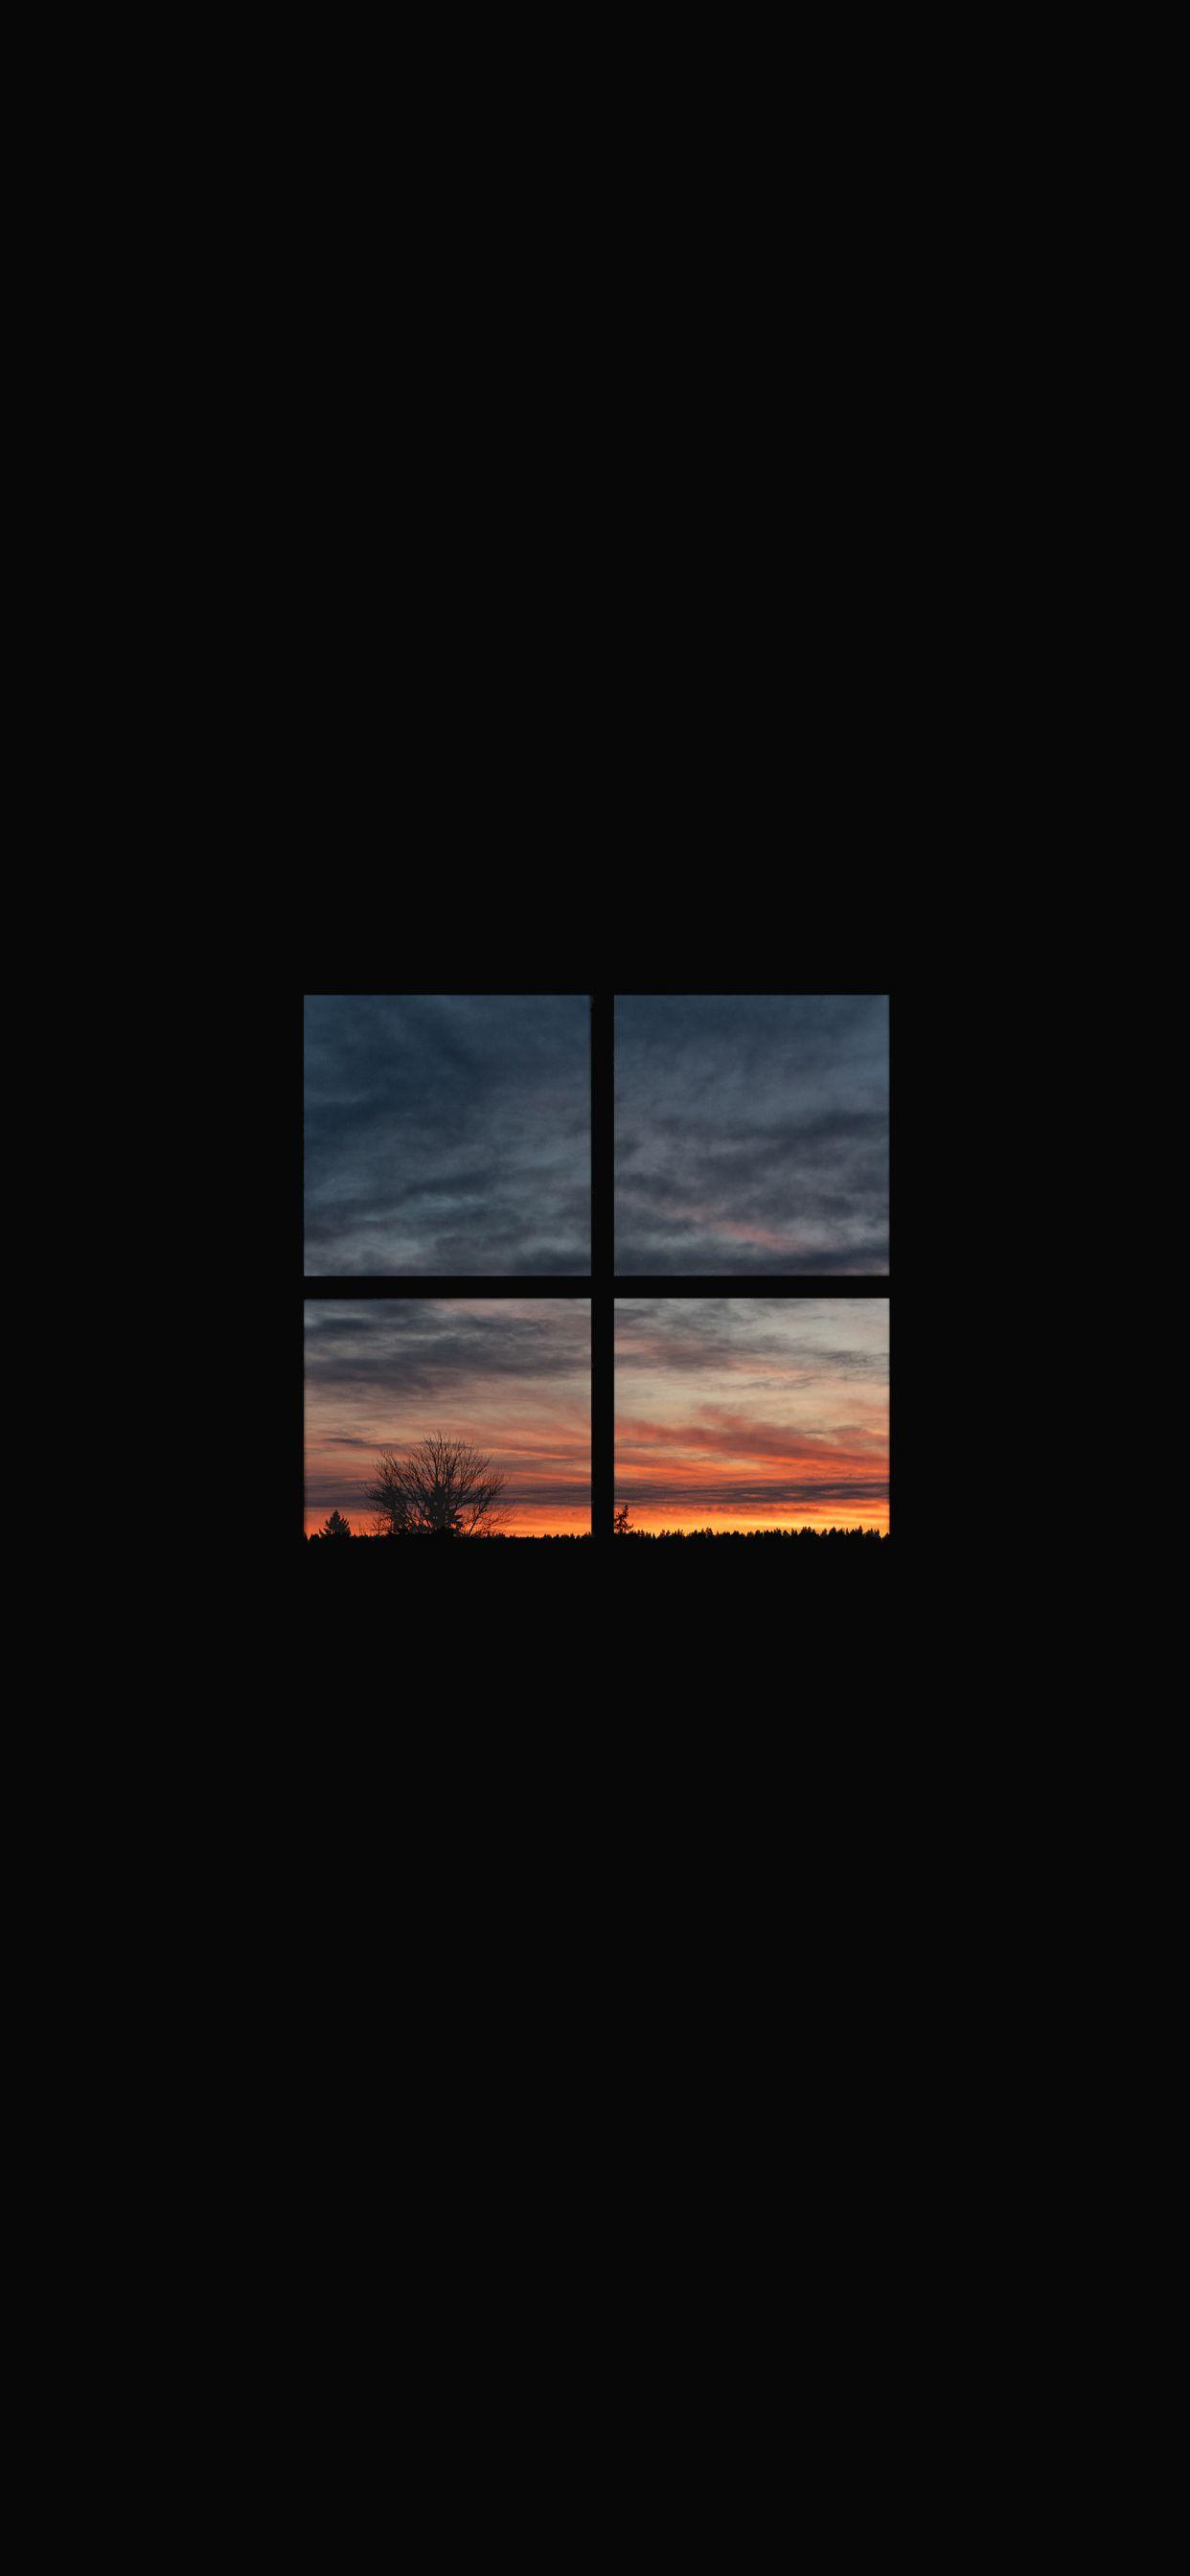 Sunset Window [OC]